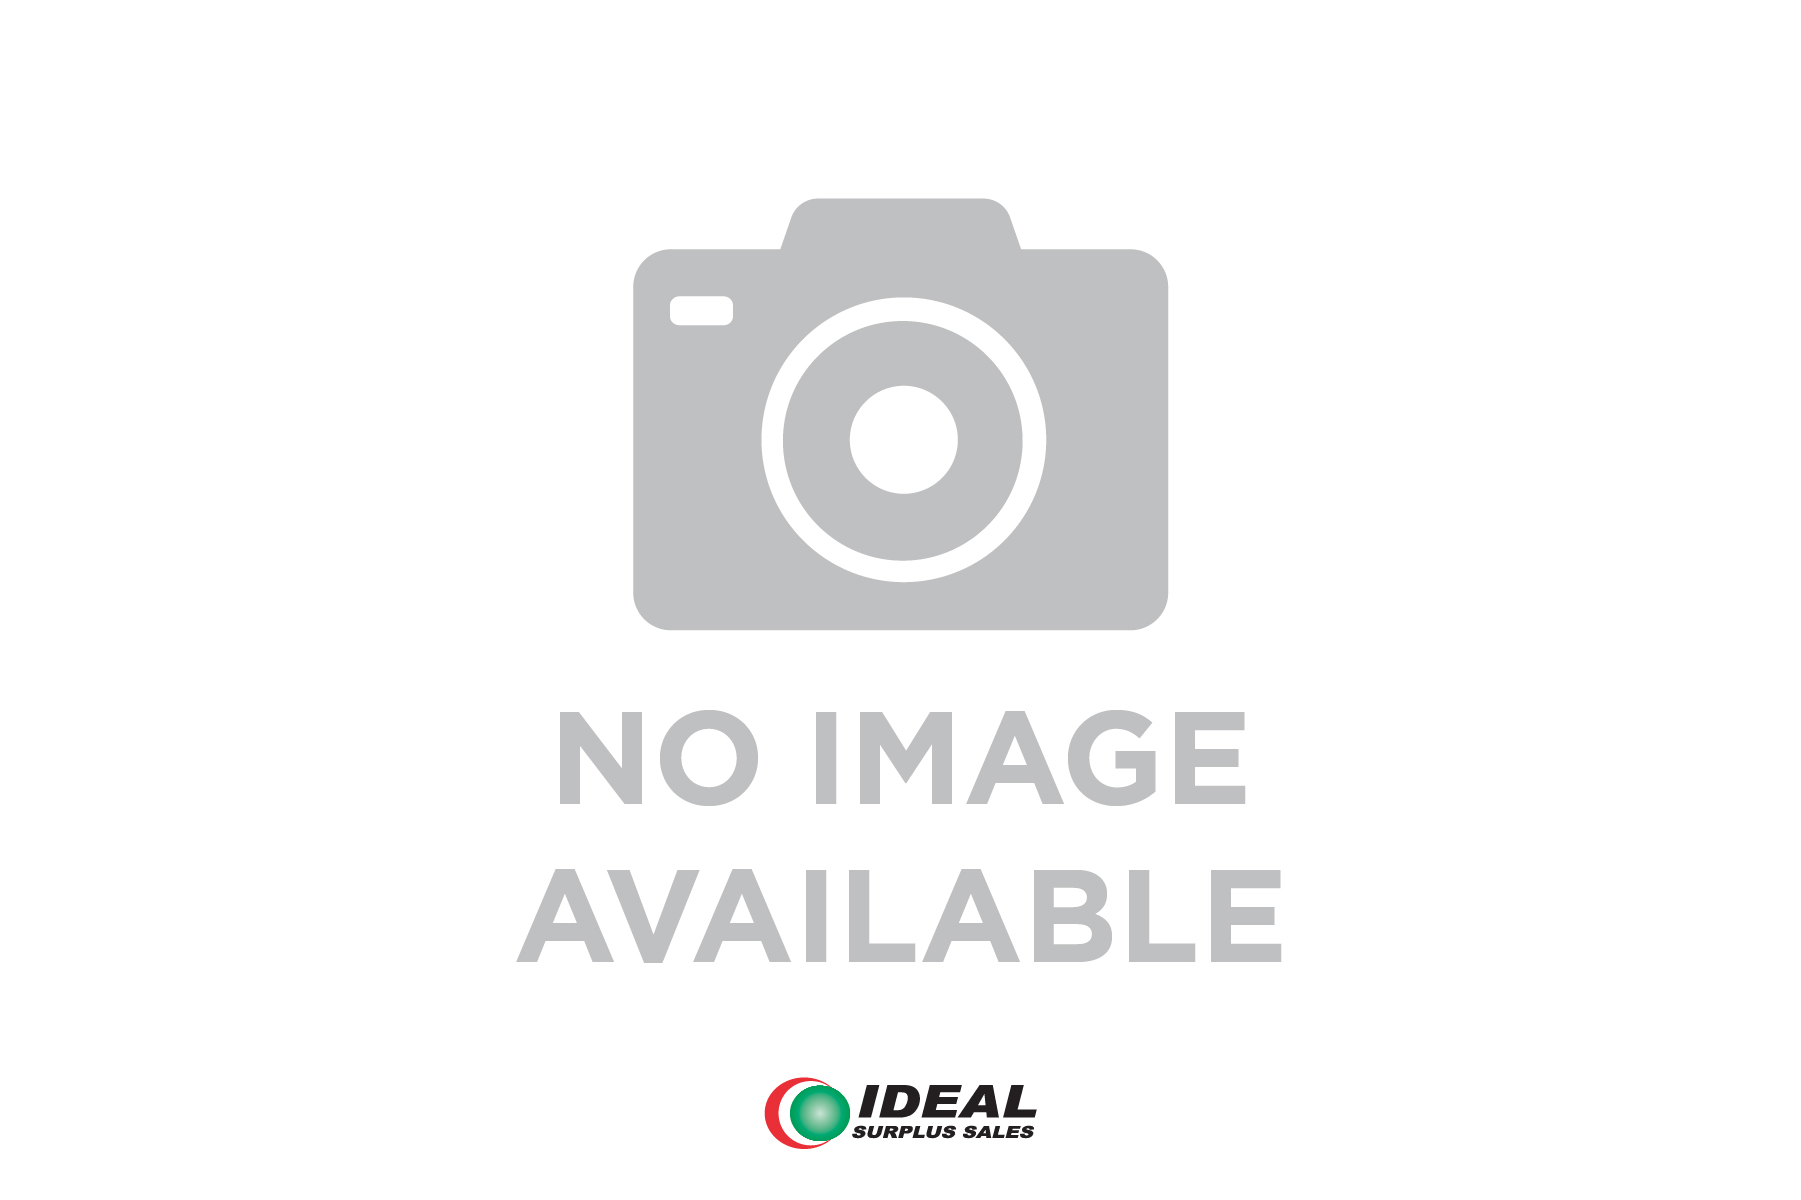 REXROTH MKD090B-047-KG2-KN MOTOR